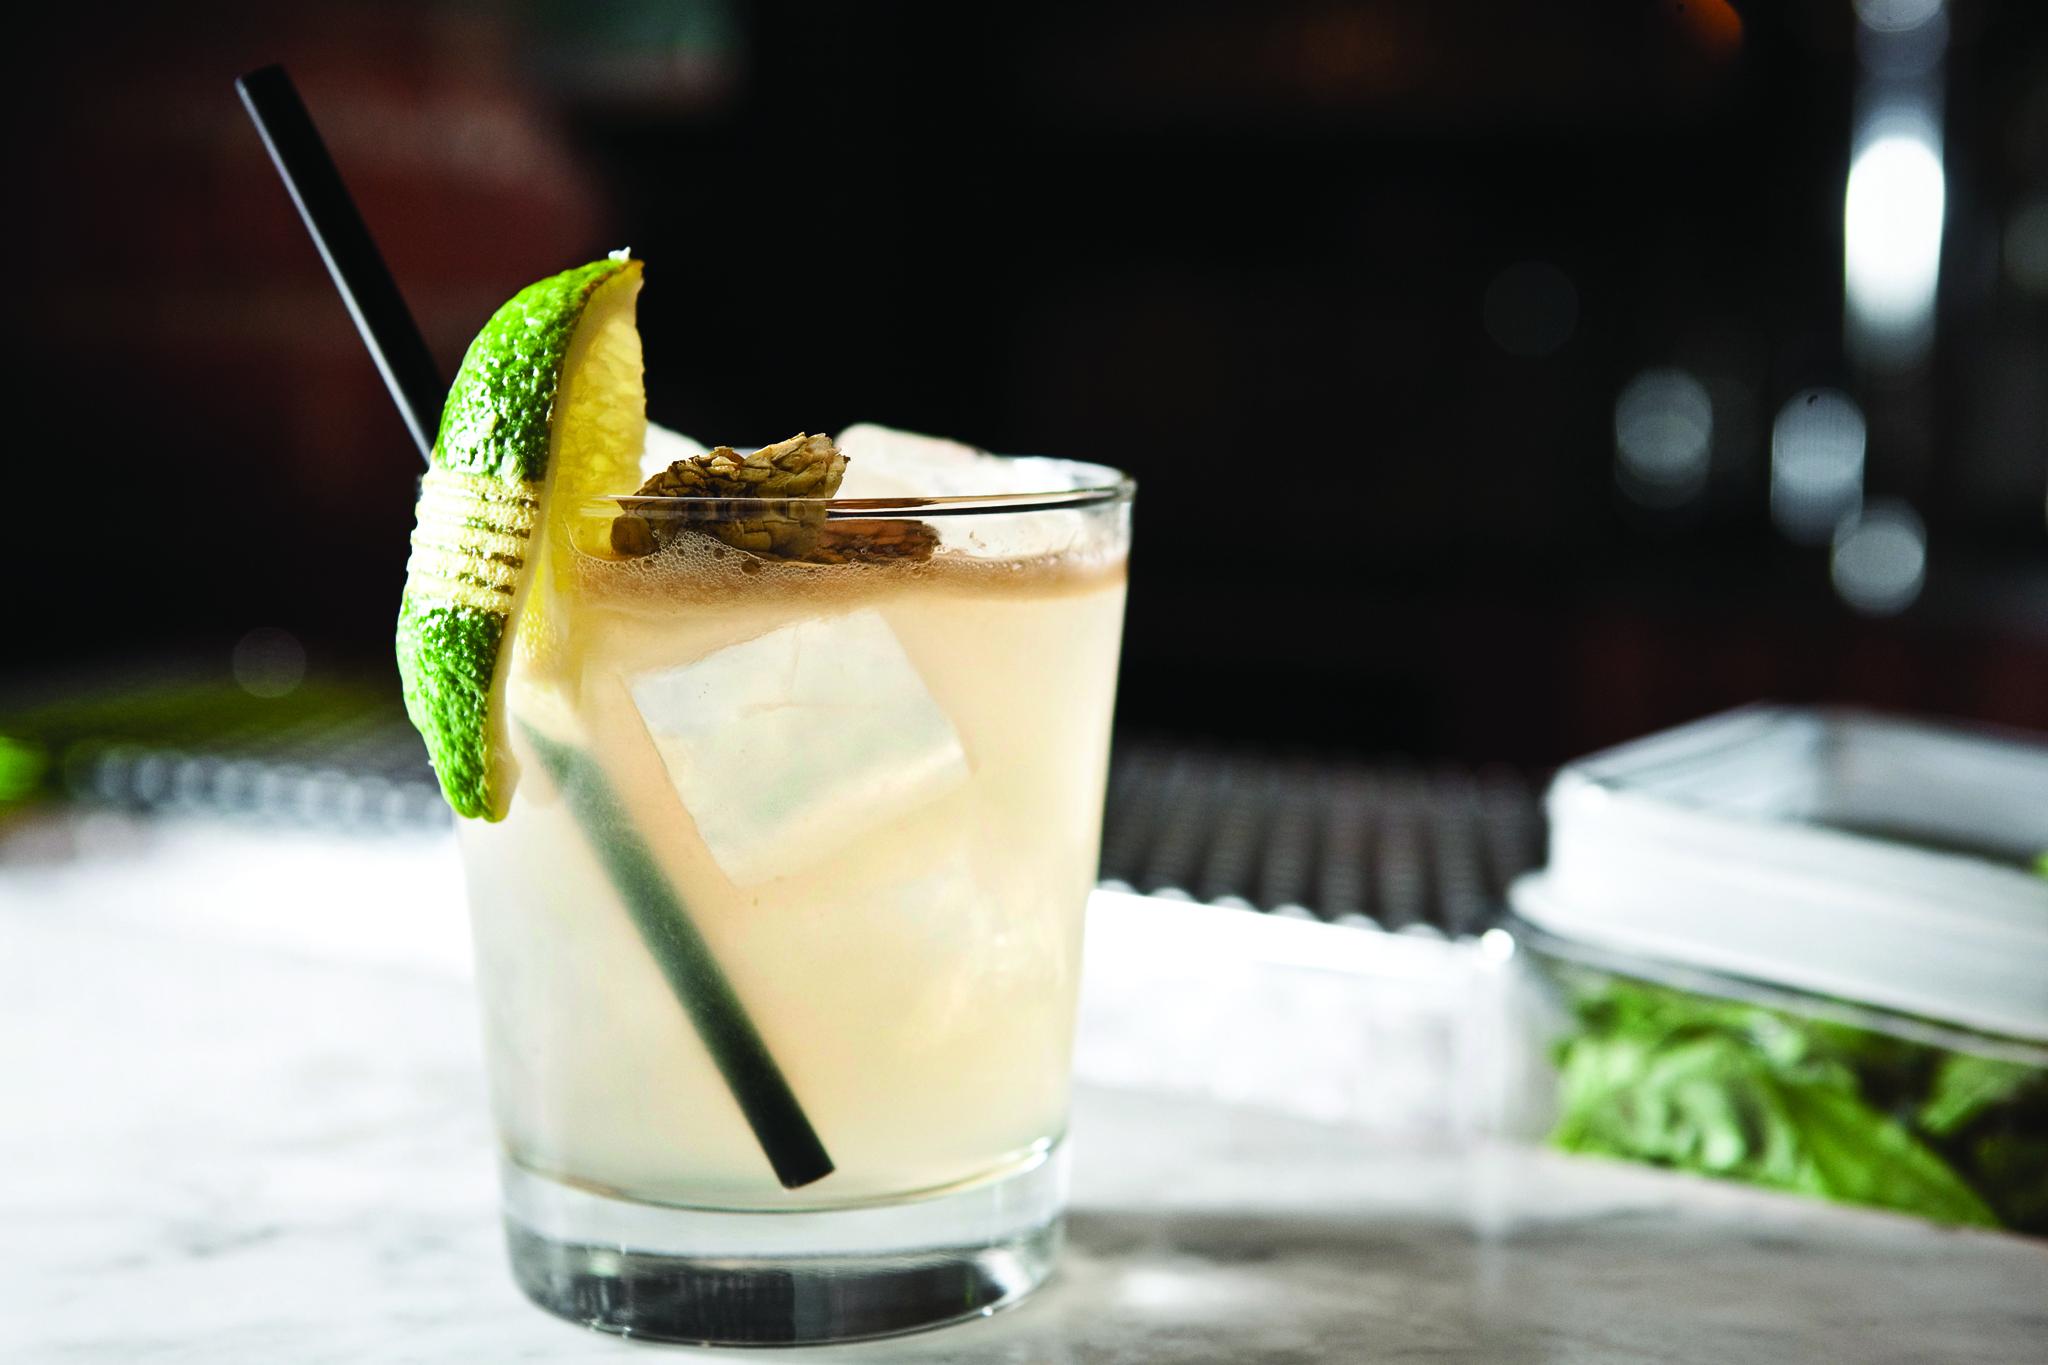 Hopped cocktails